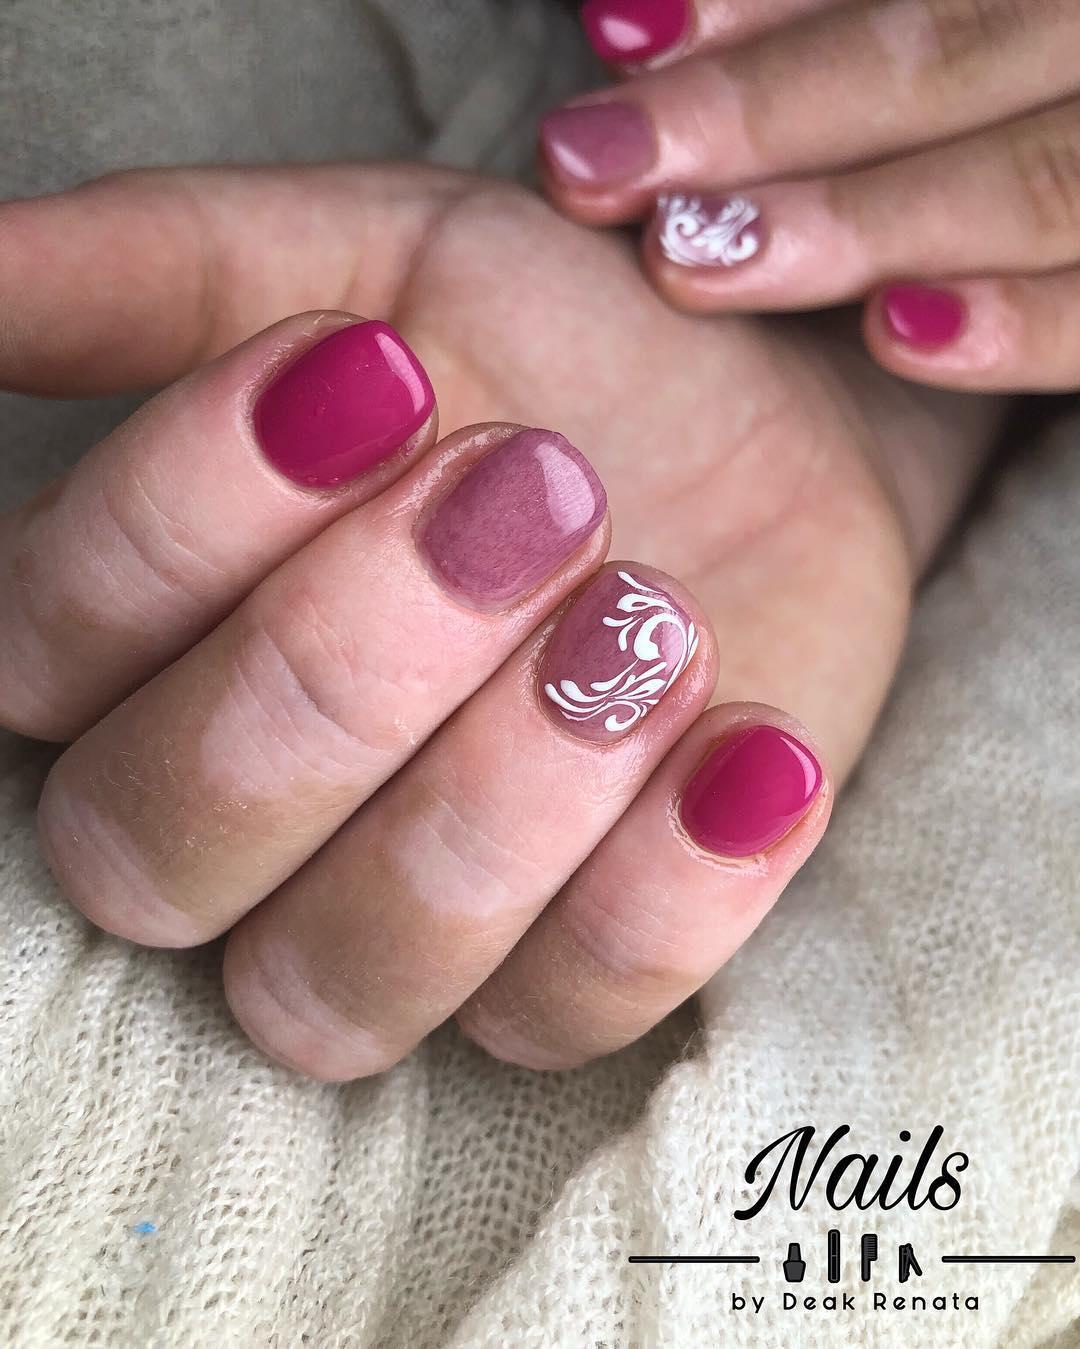 cool pink nail designs 2019 12 - 21 Cool Pink Nail Designs 2019